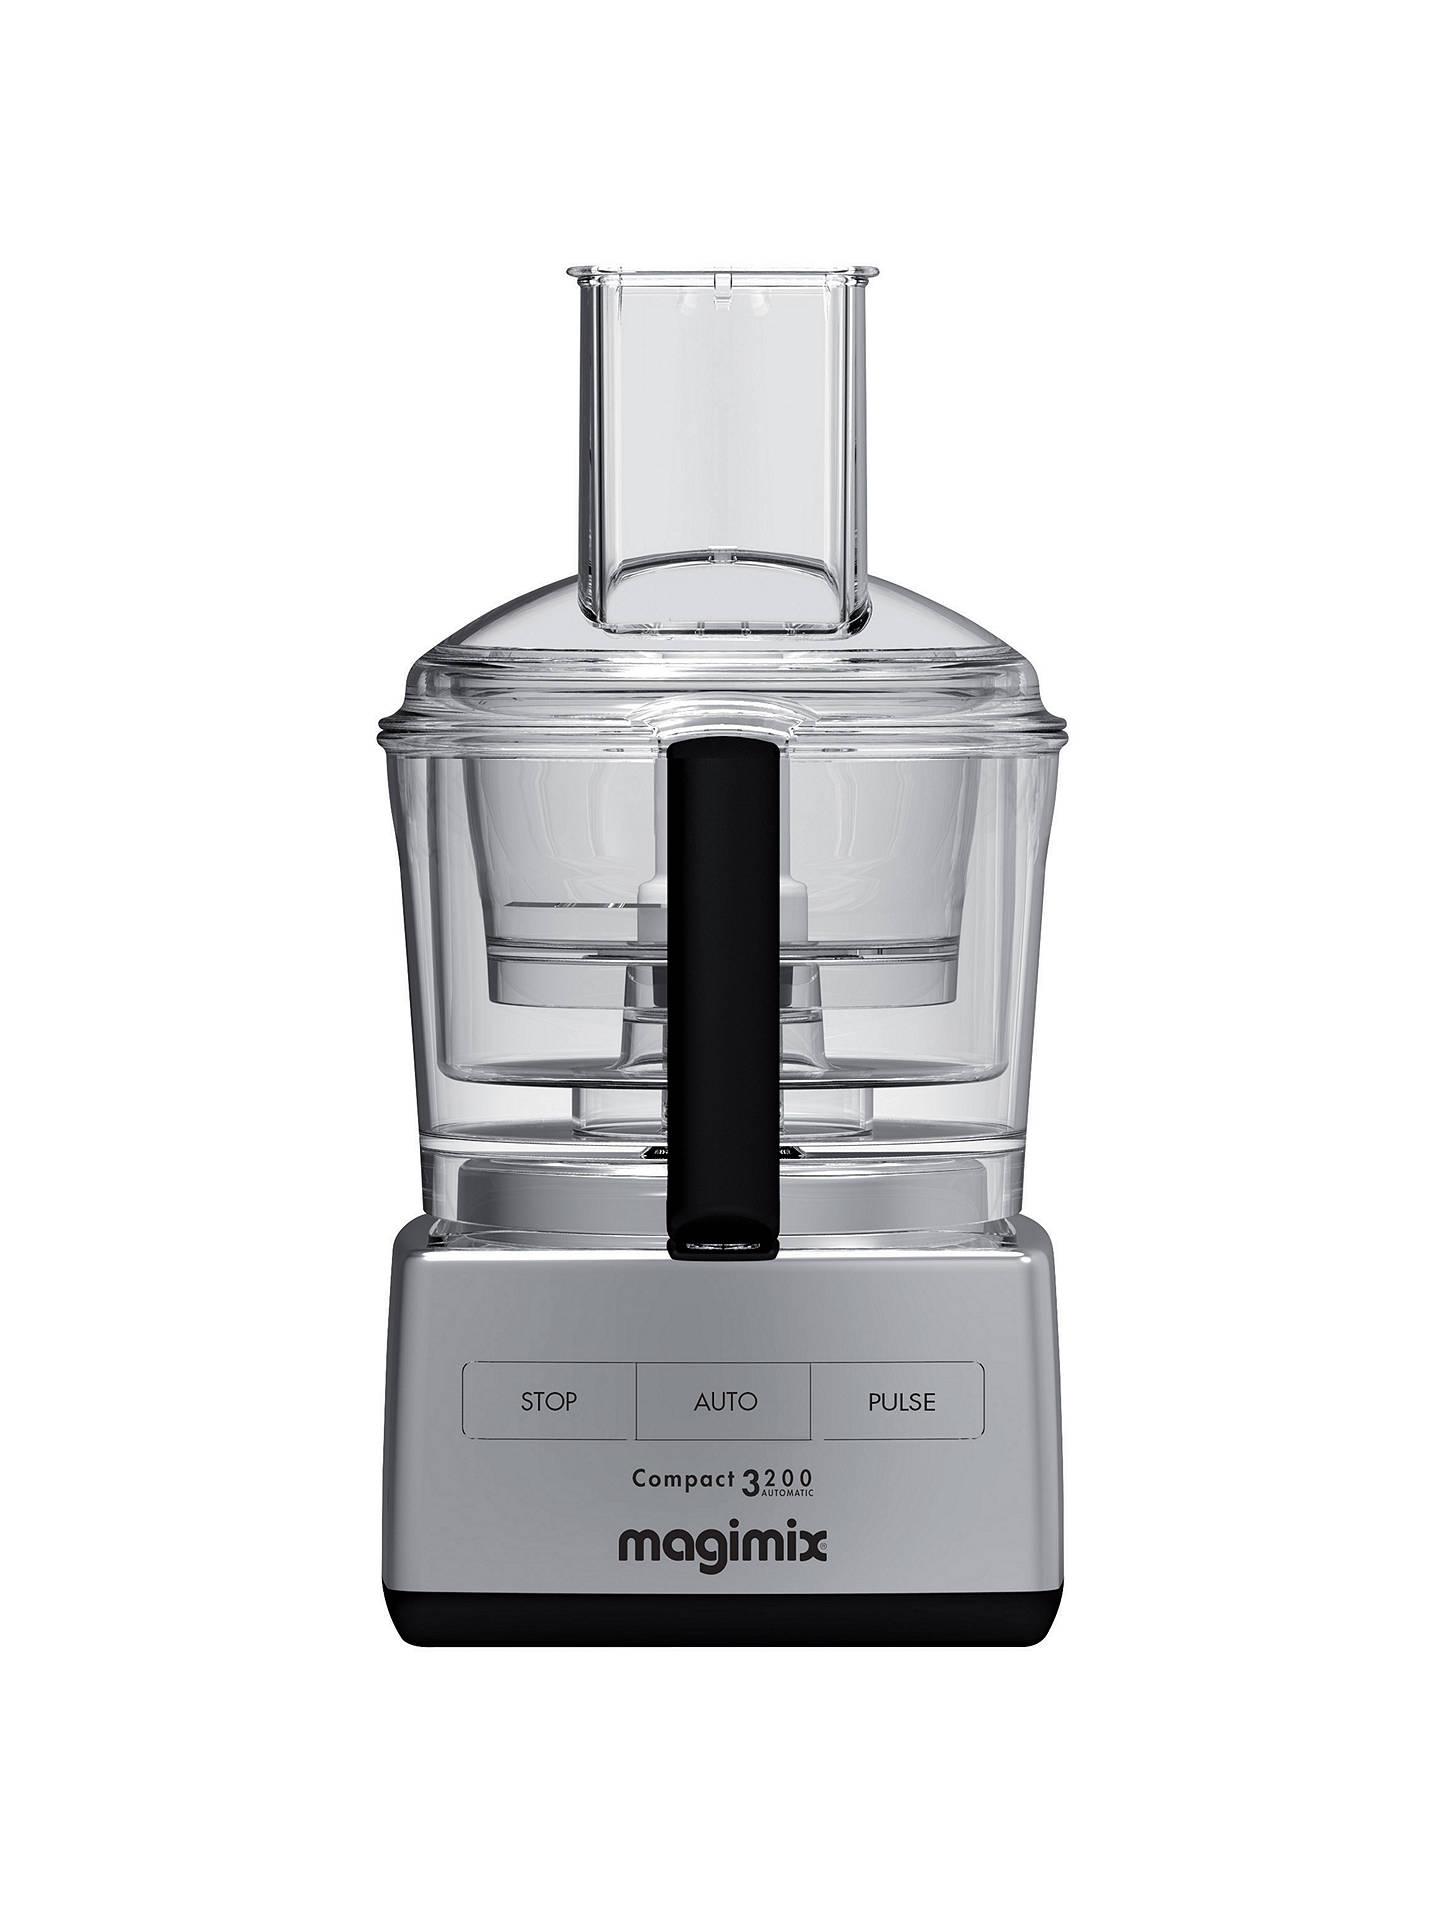 magimix 3200 blendermix food processor at john lewis. Black Bedroom Furniture Sets. Home Design Ideas